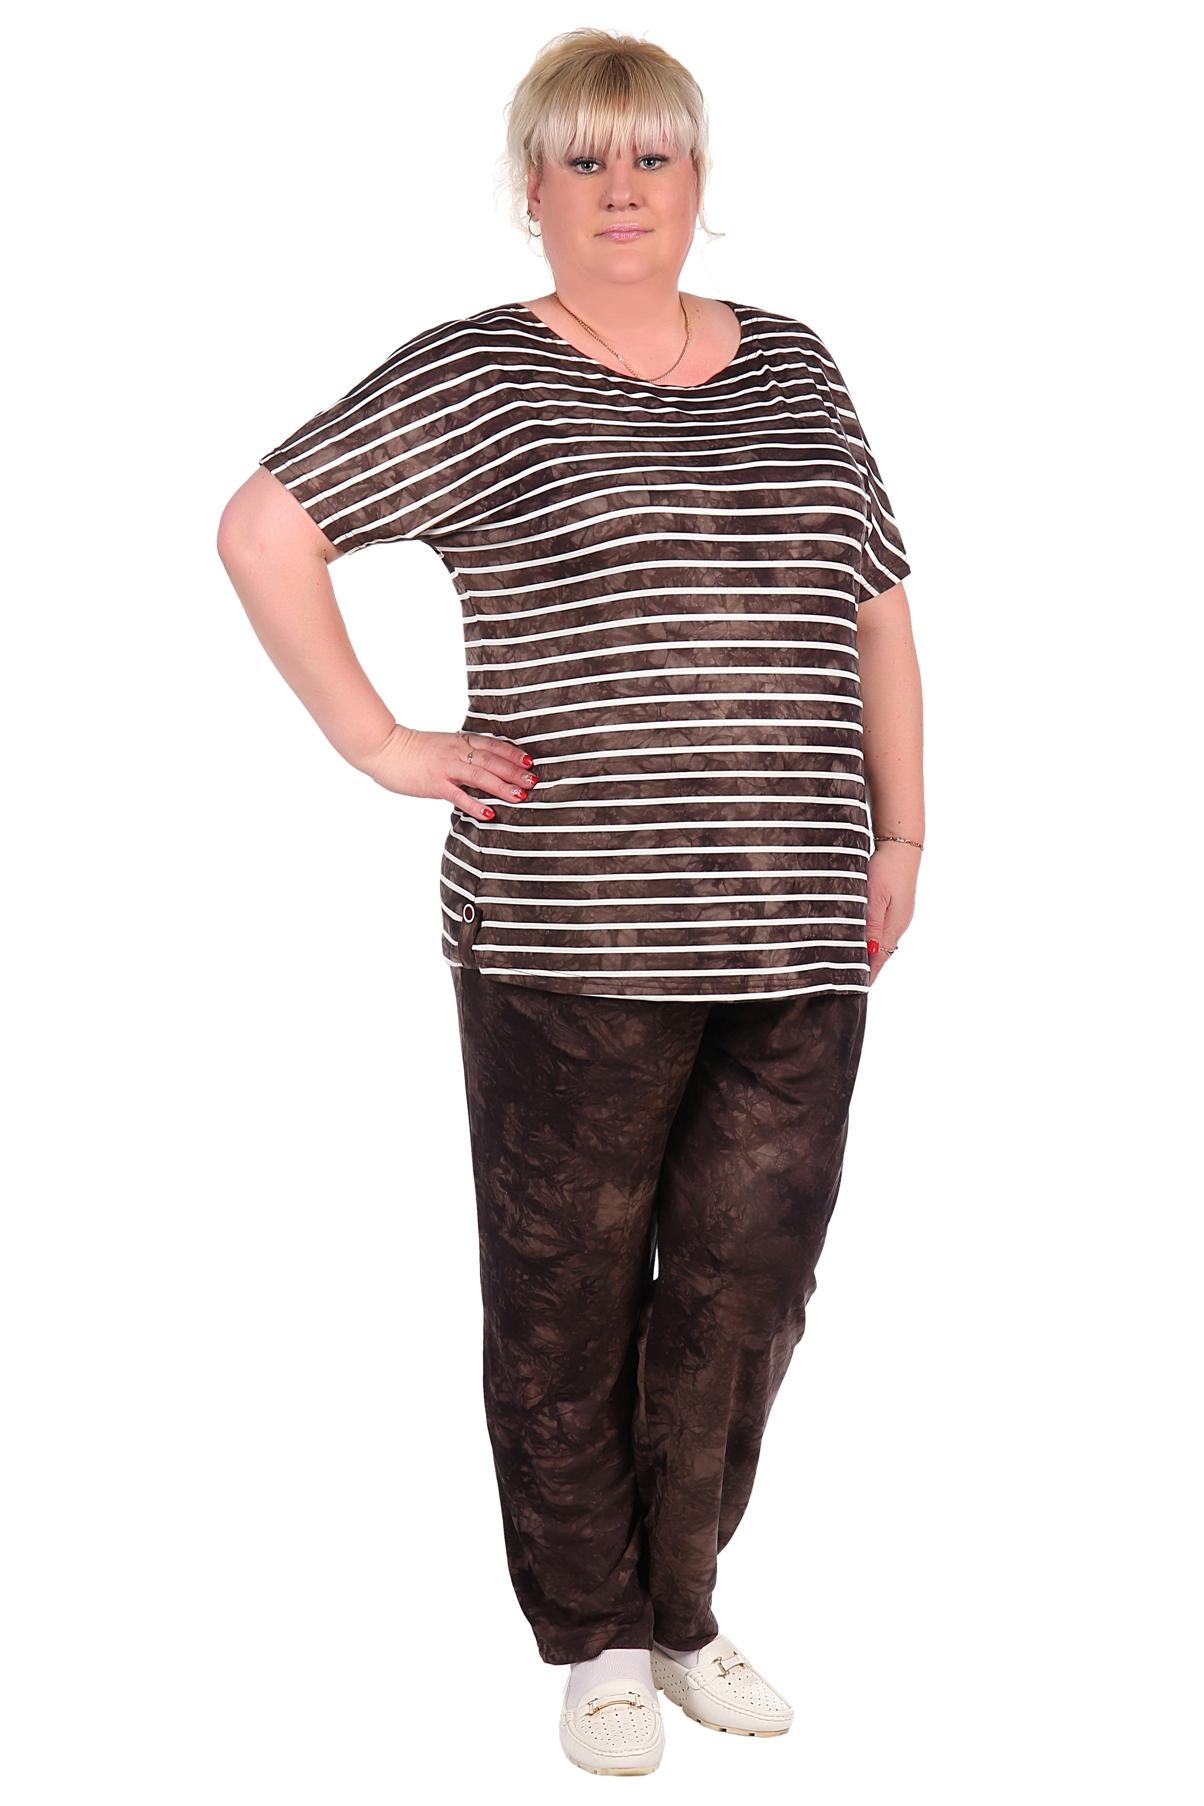 Жен. костюм арт. 16-0018 Коричневый р. 66Костюмы<br><br><br>Тип: Жен. костюм<br>Размер: 66<br>Материал: Вискоза